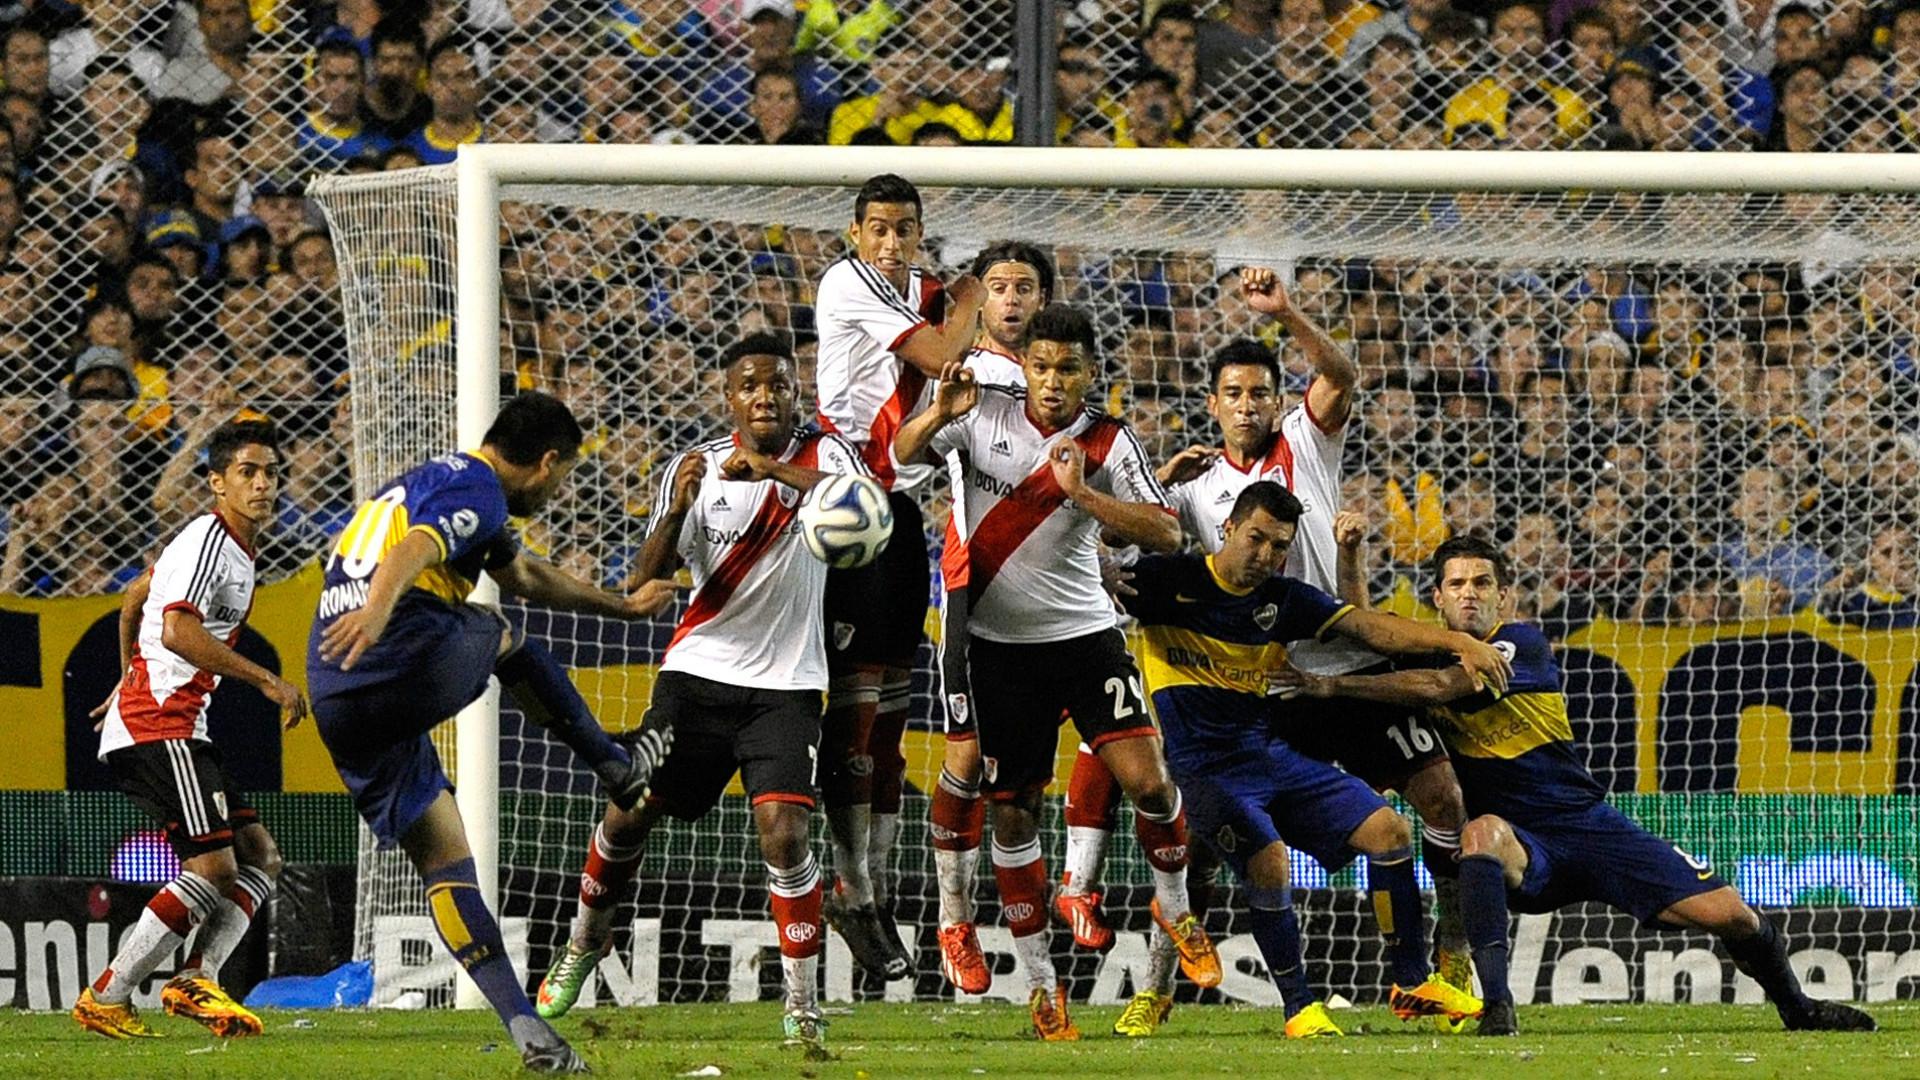 Todos los partidos de Riquelme ante River   Goal.com